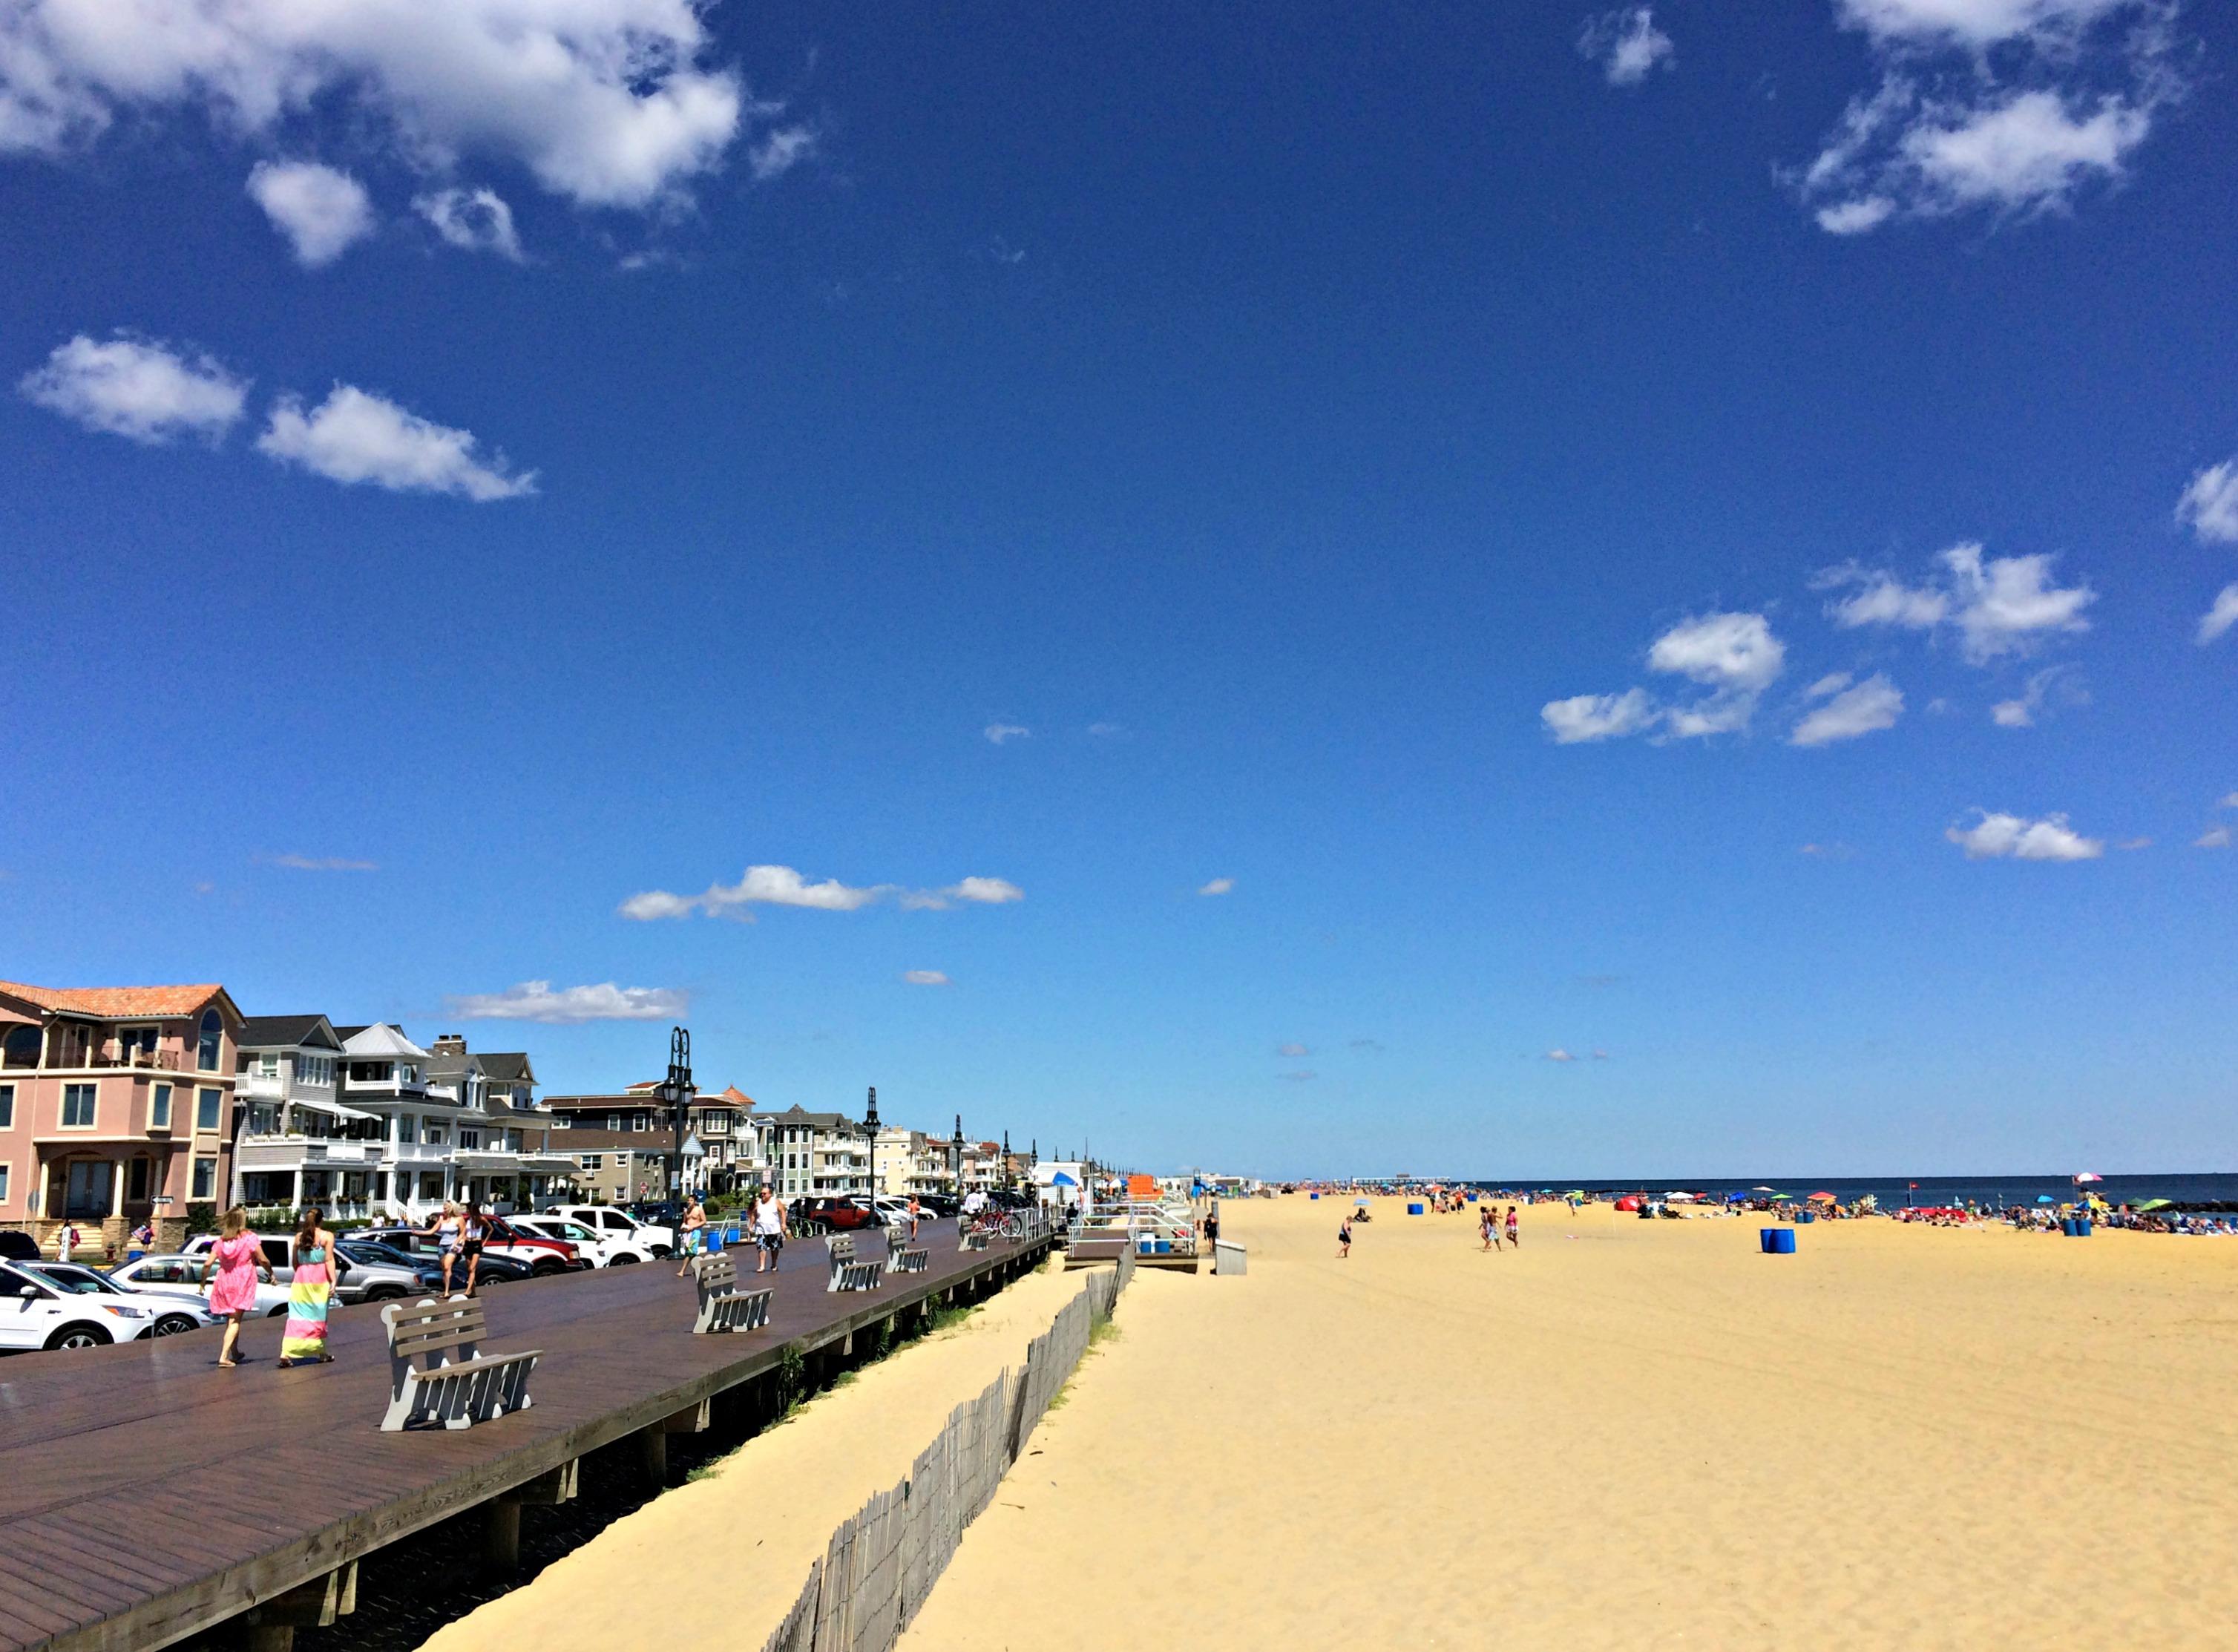 belmar beach, new jersey shore